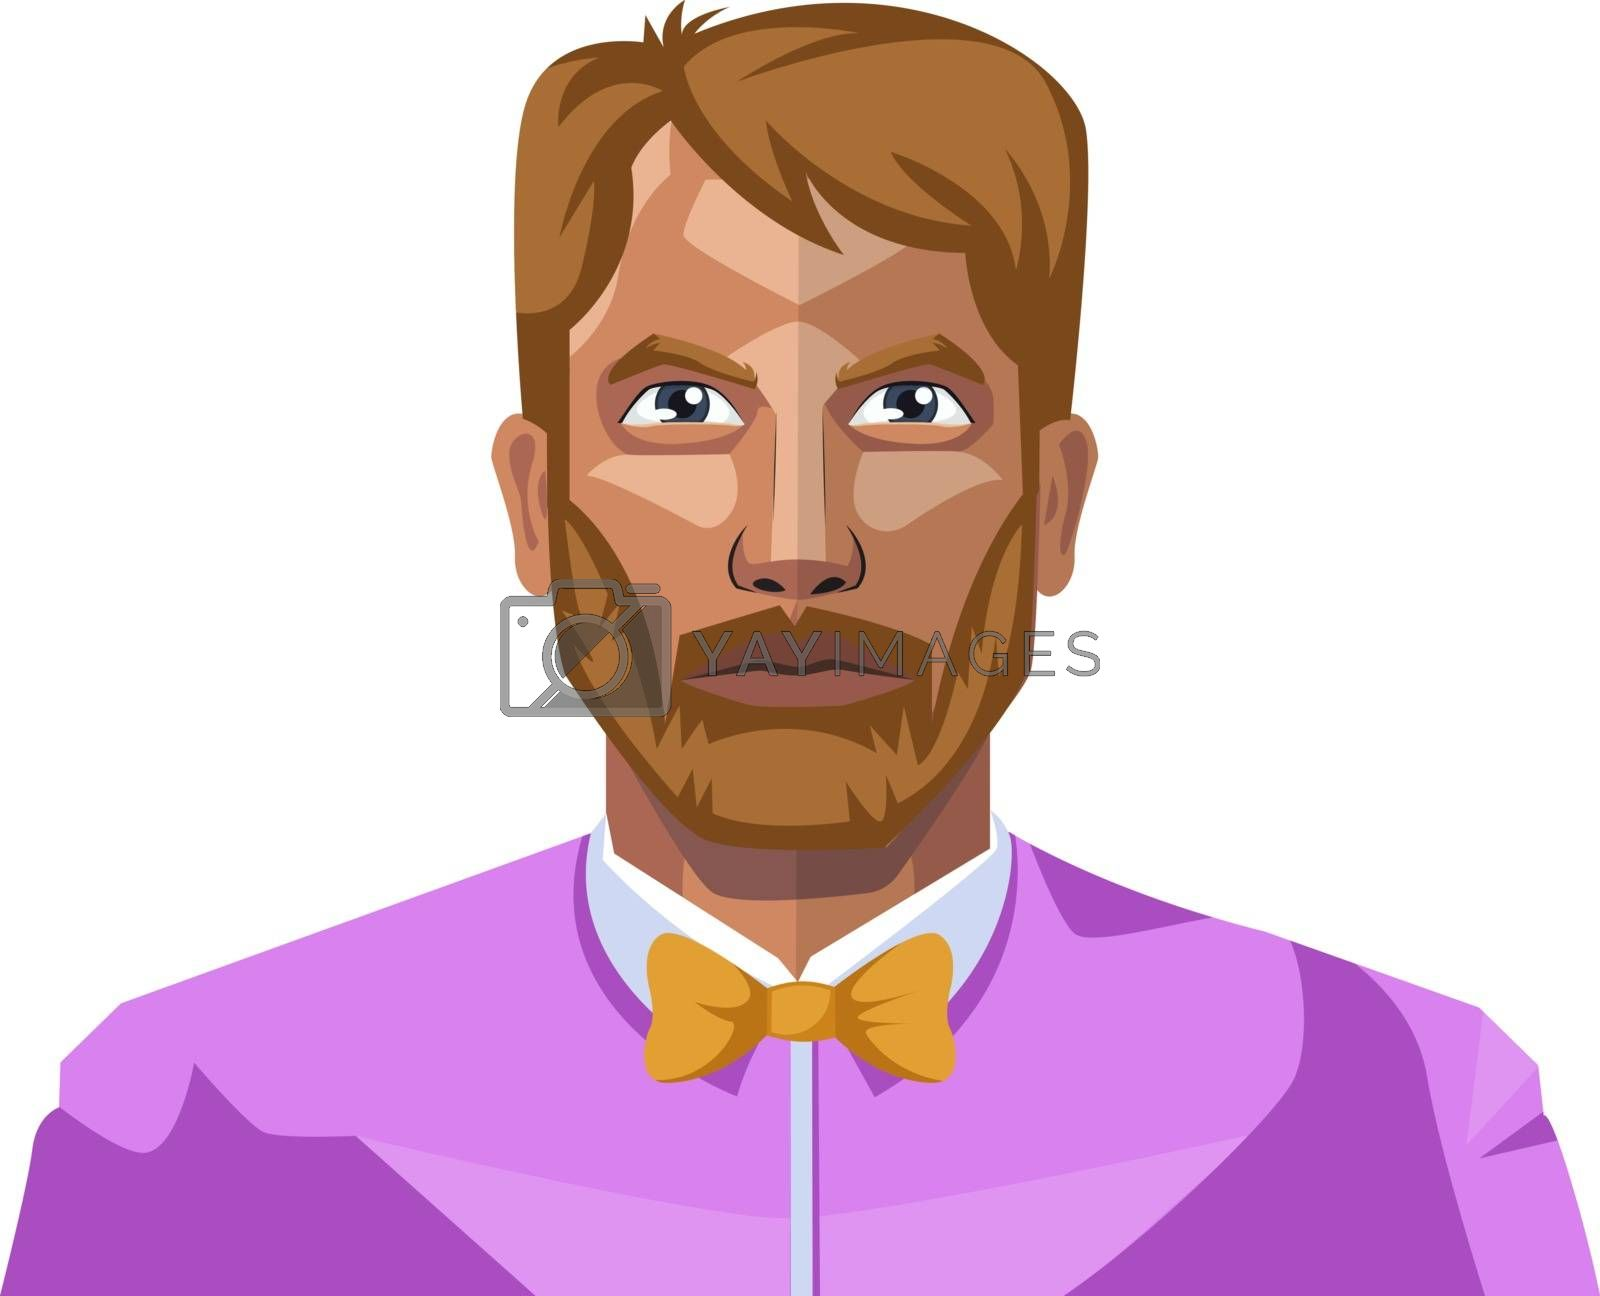 Royalty free image of Full bearded guy illustration vector on white background by Morphart